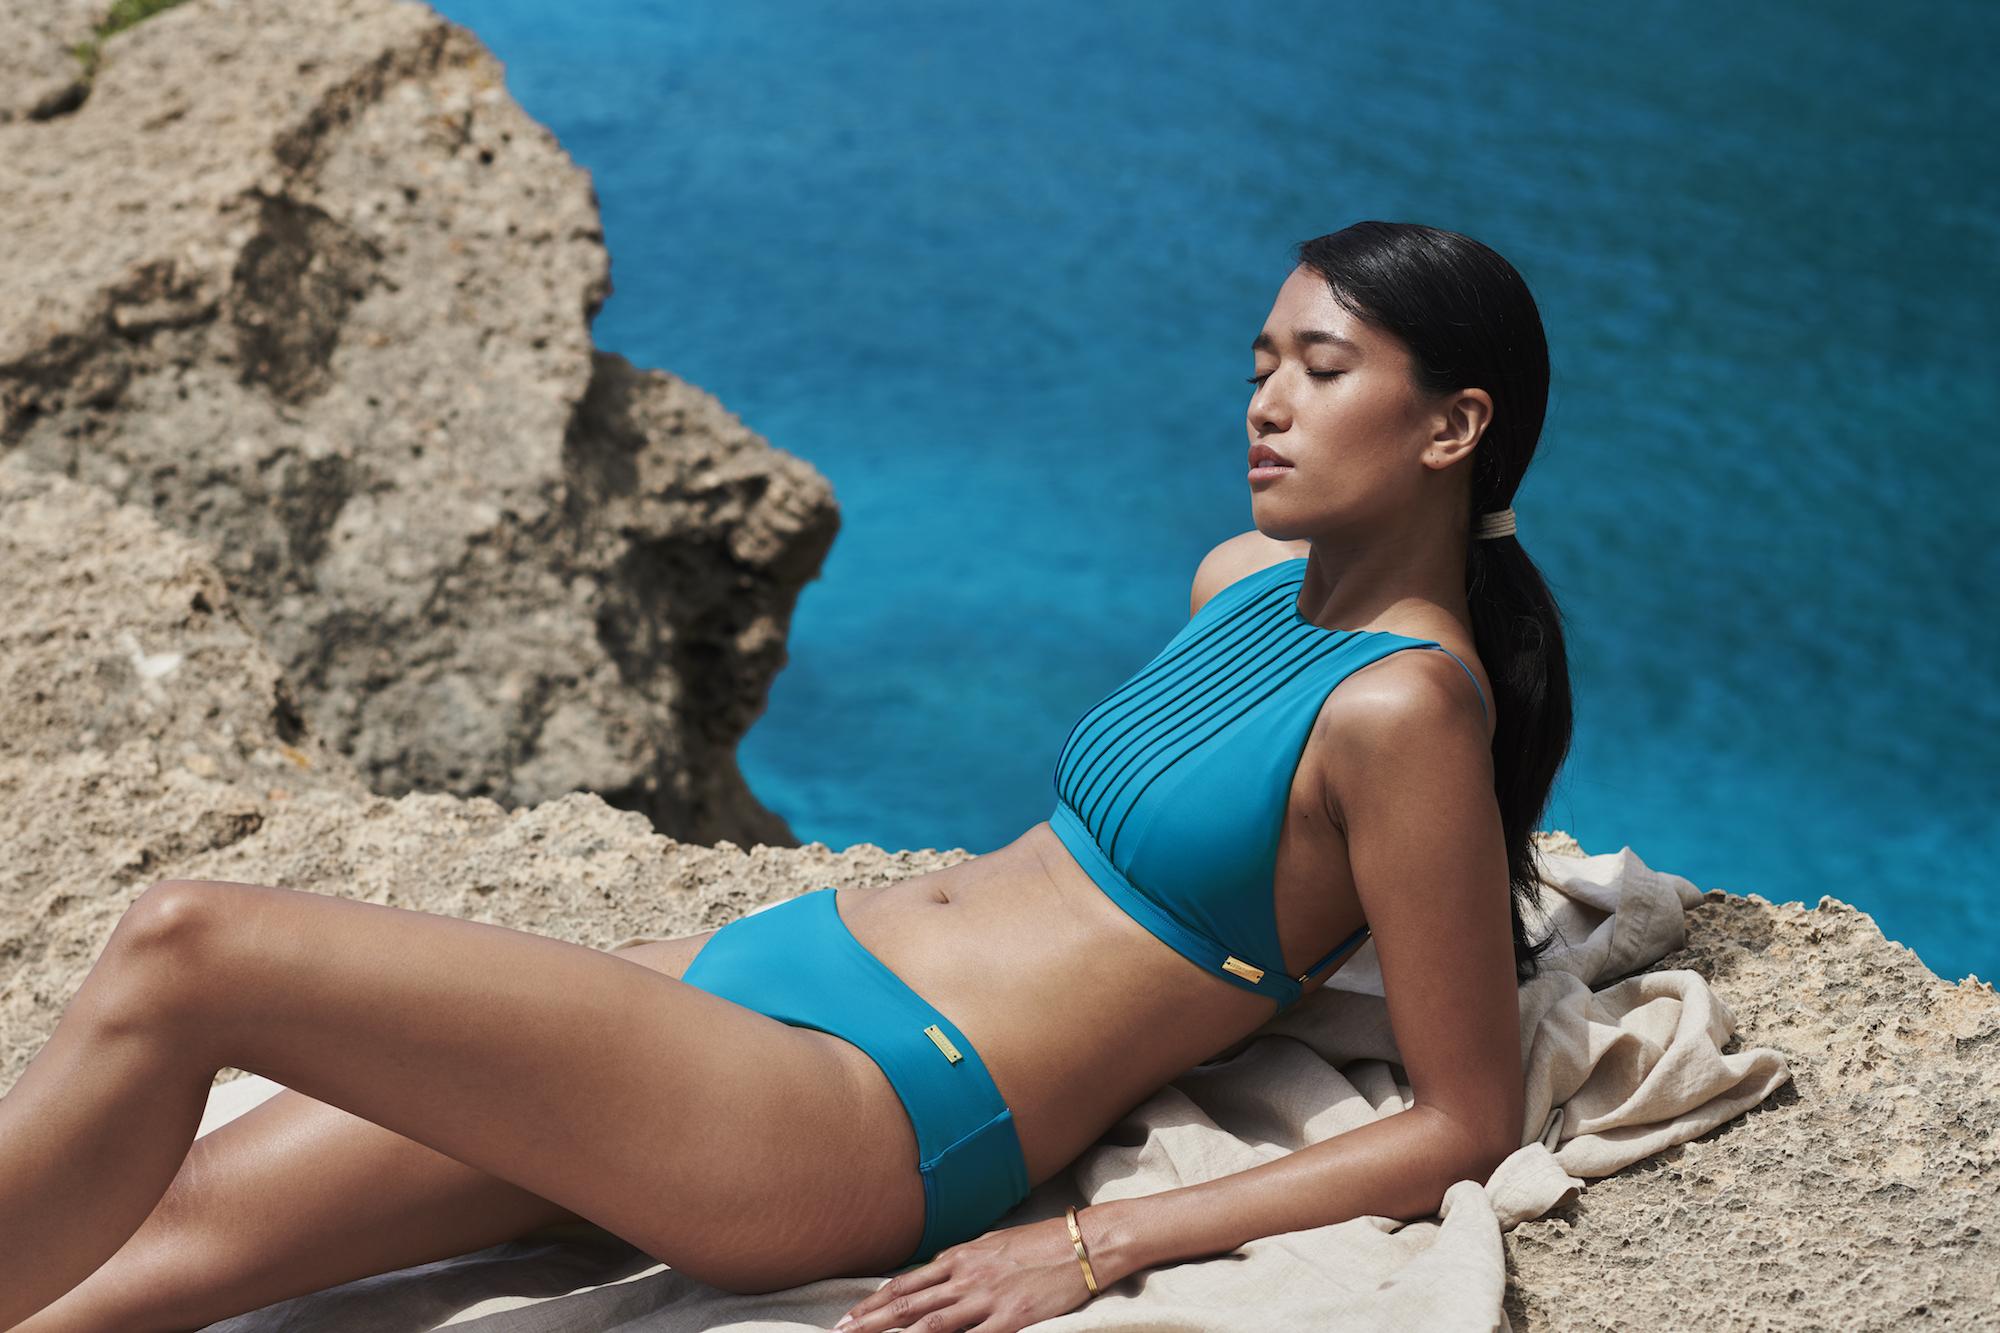 22Paradise-high-neck-bikini-top-pleats-coverage-bottom-petrol_28397.jpg